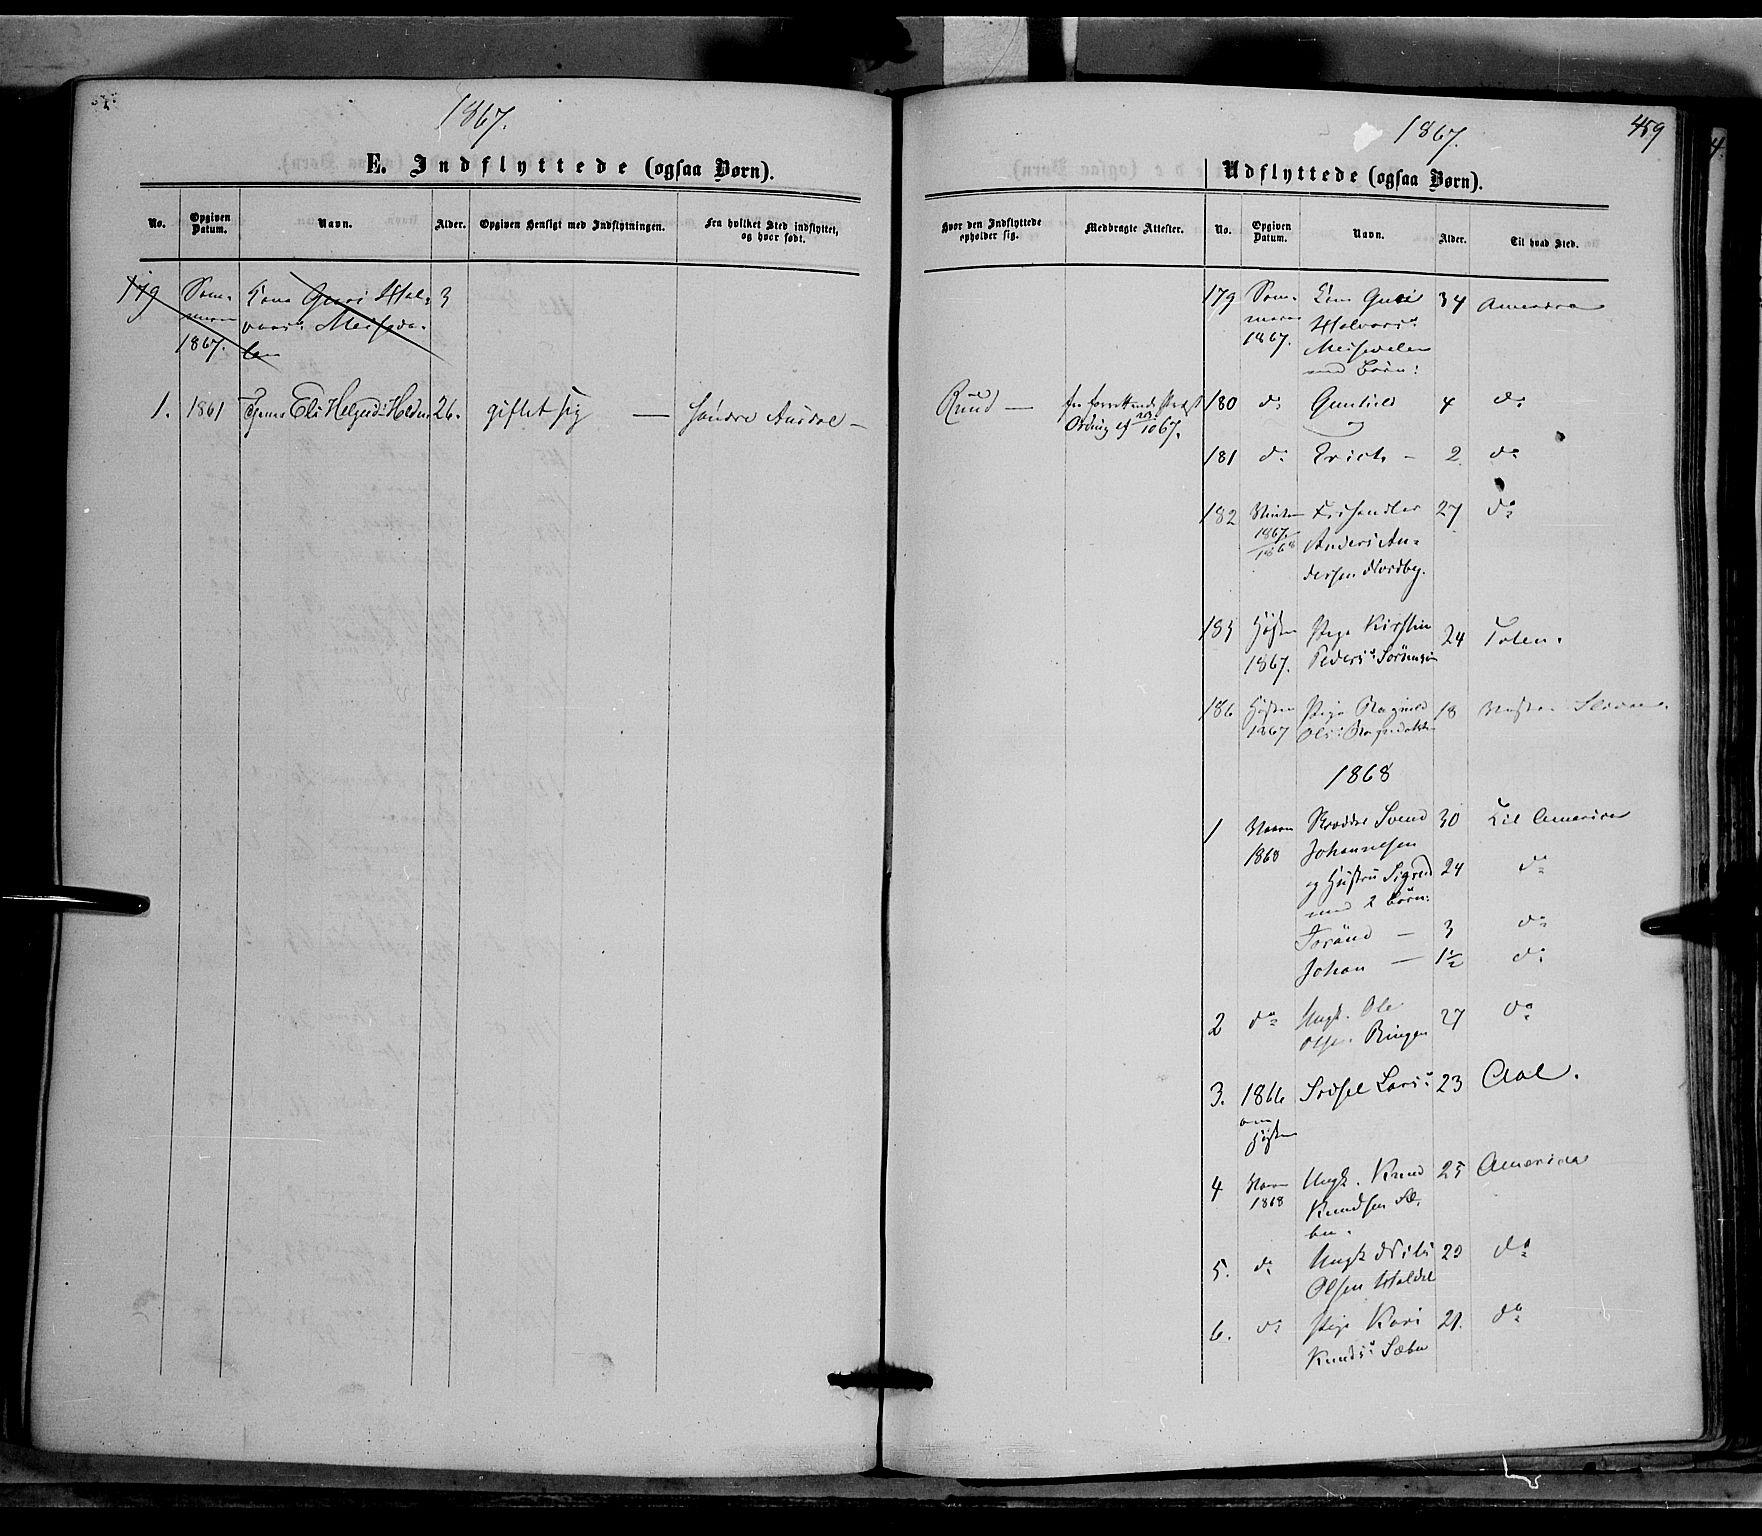 SAH, Nord-Aurdal prestekontor, Ministerialbok nr. 8, 1863-1875, s. 459